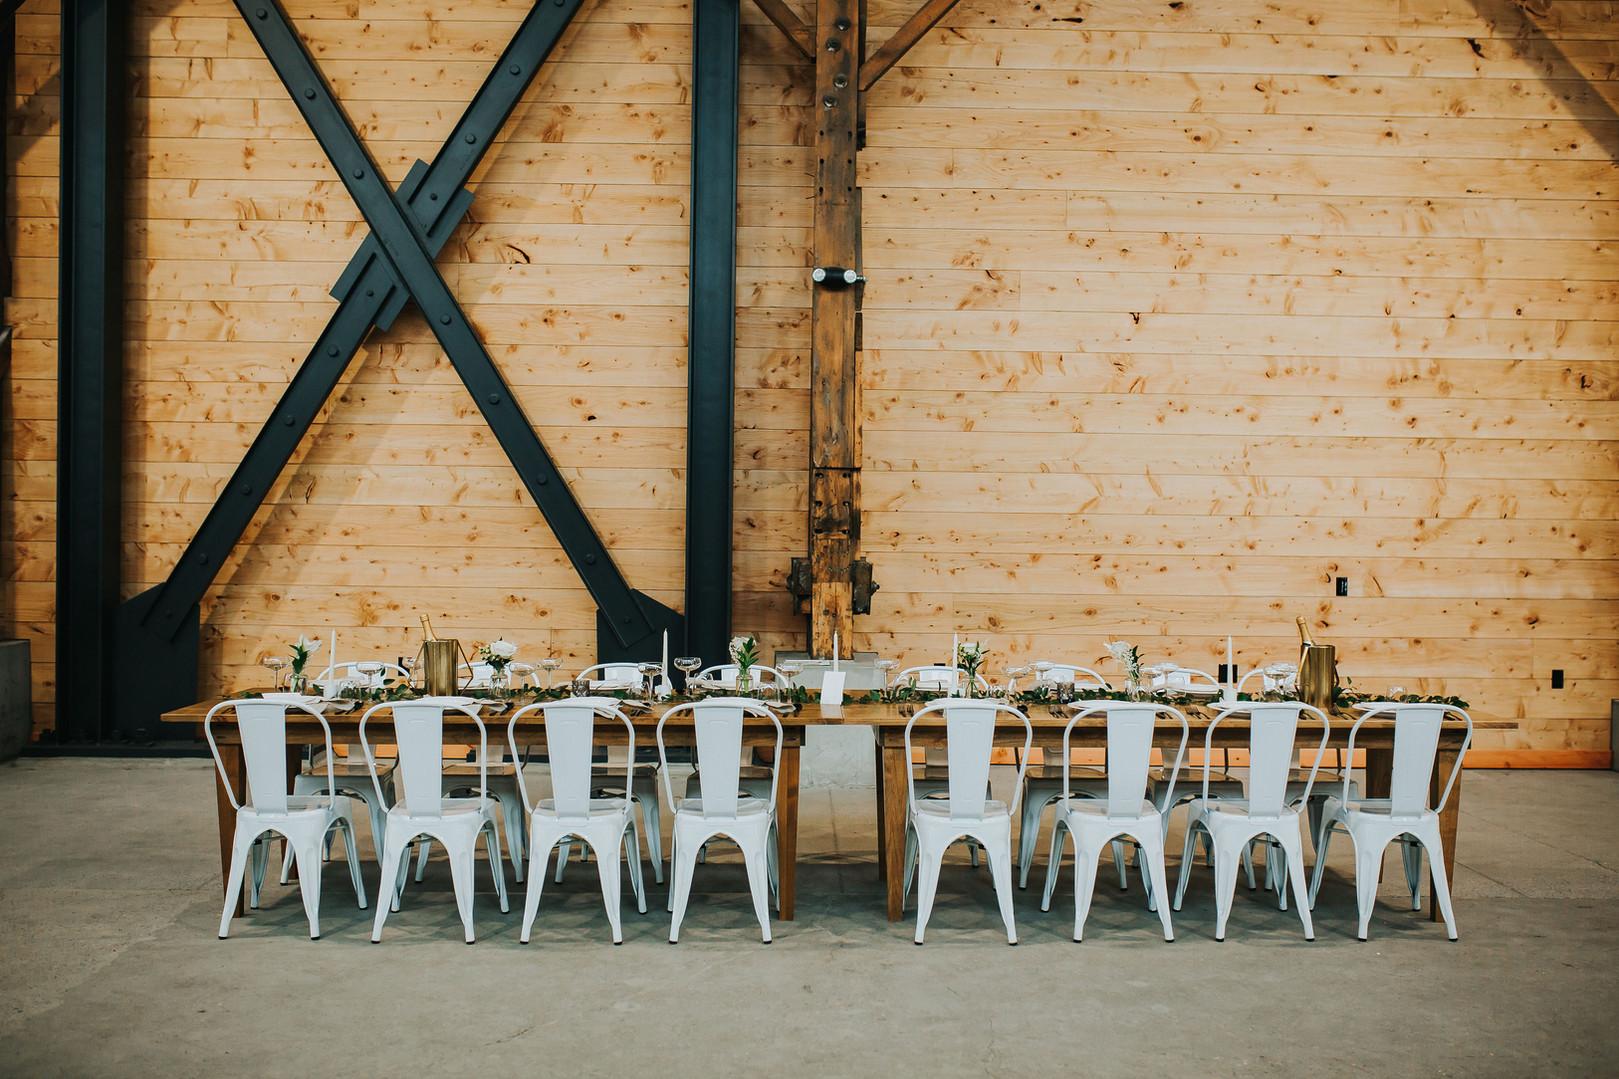 Farm Table at the Redd